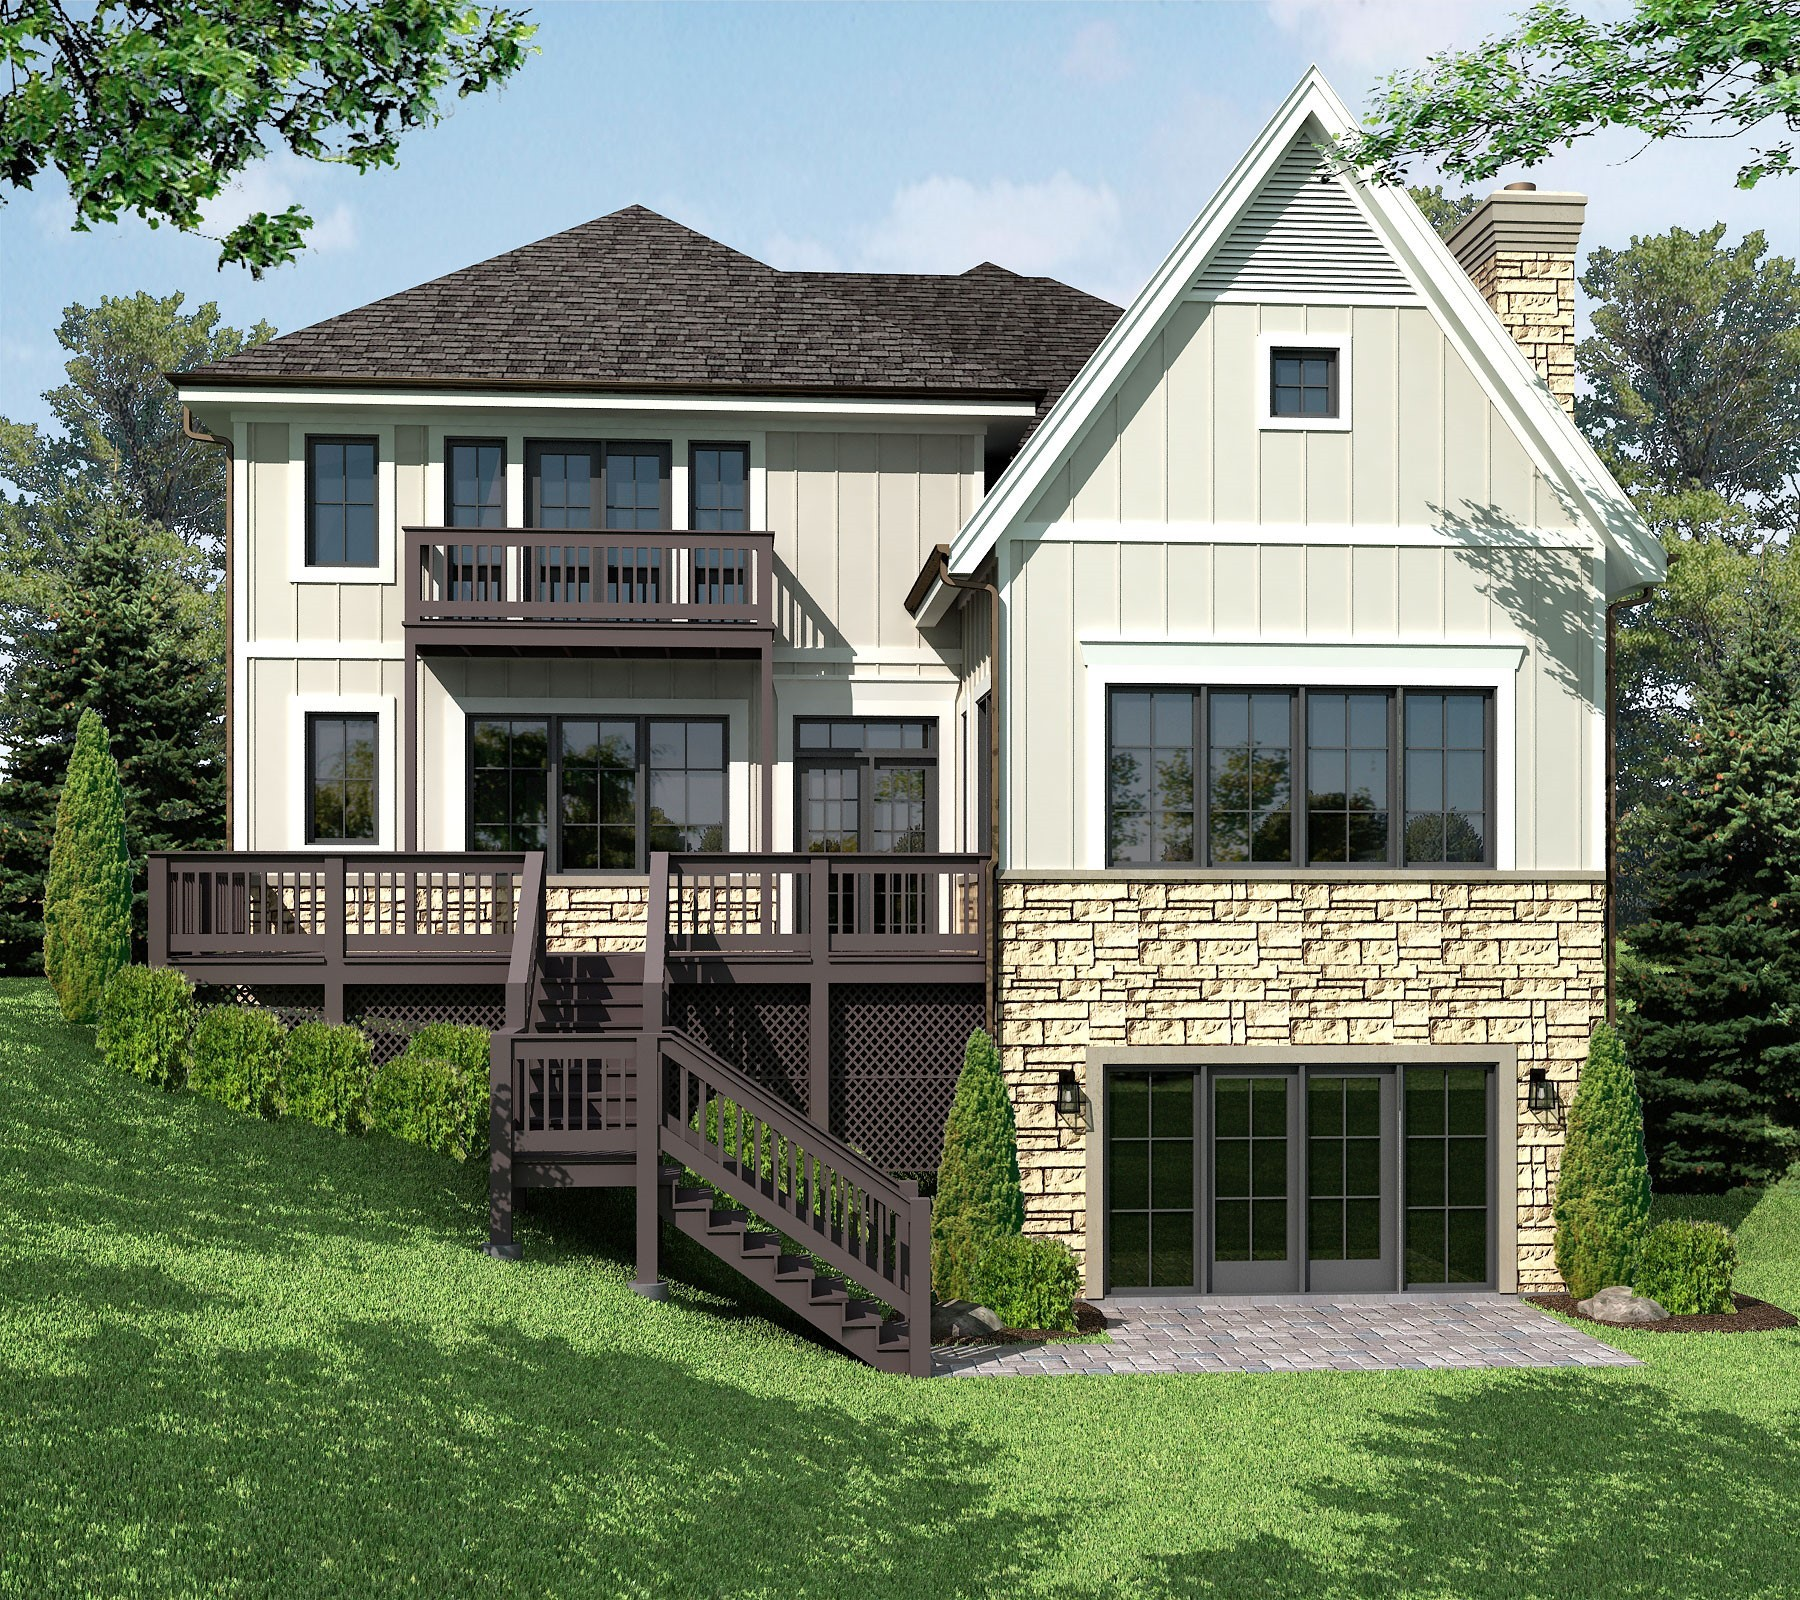 The Ravine Estate House: 840 Grove Street, Glencoe, Illinois